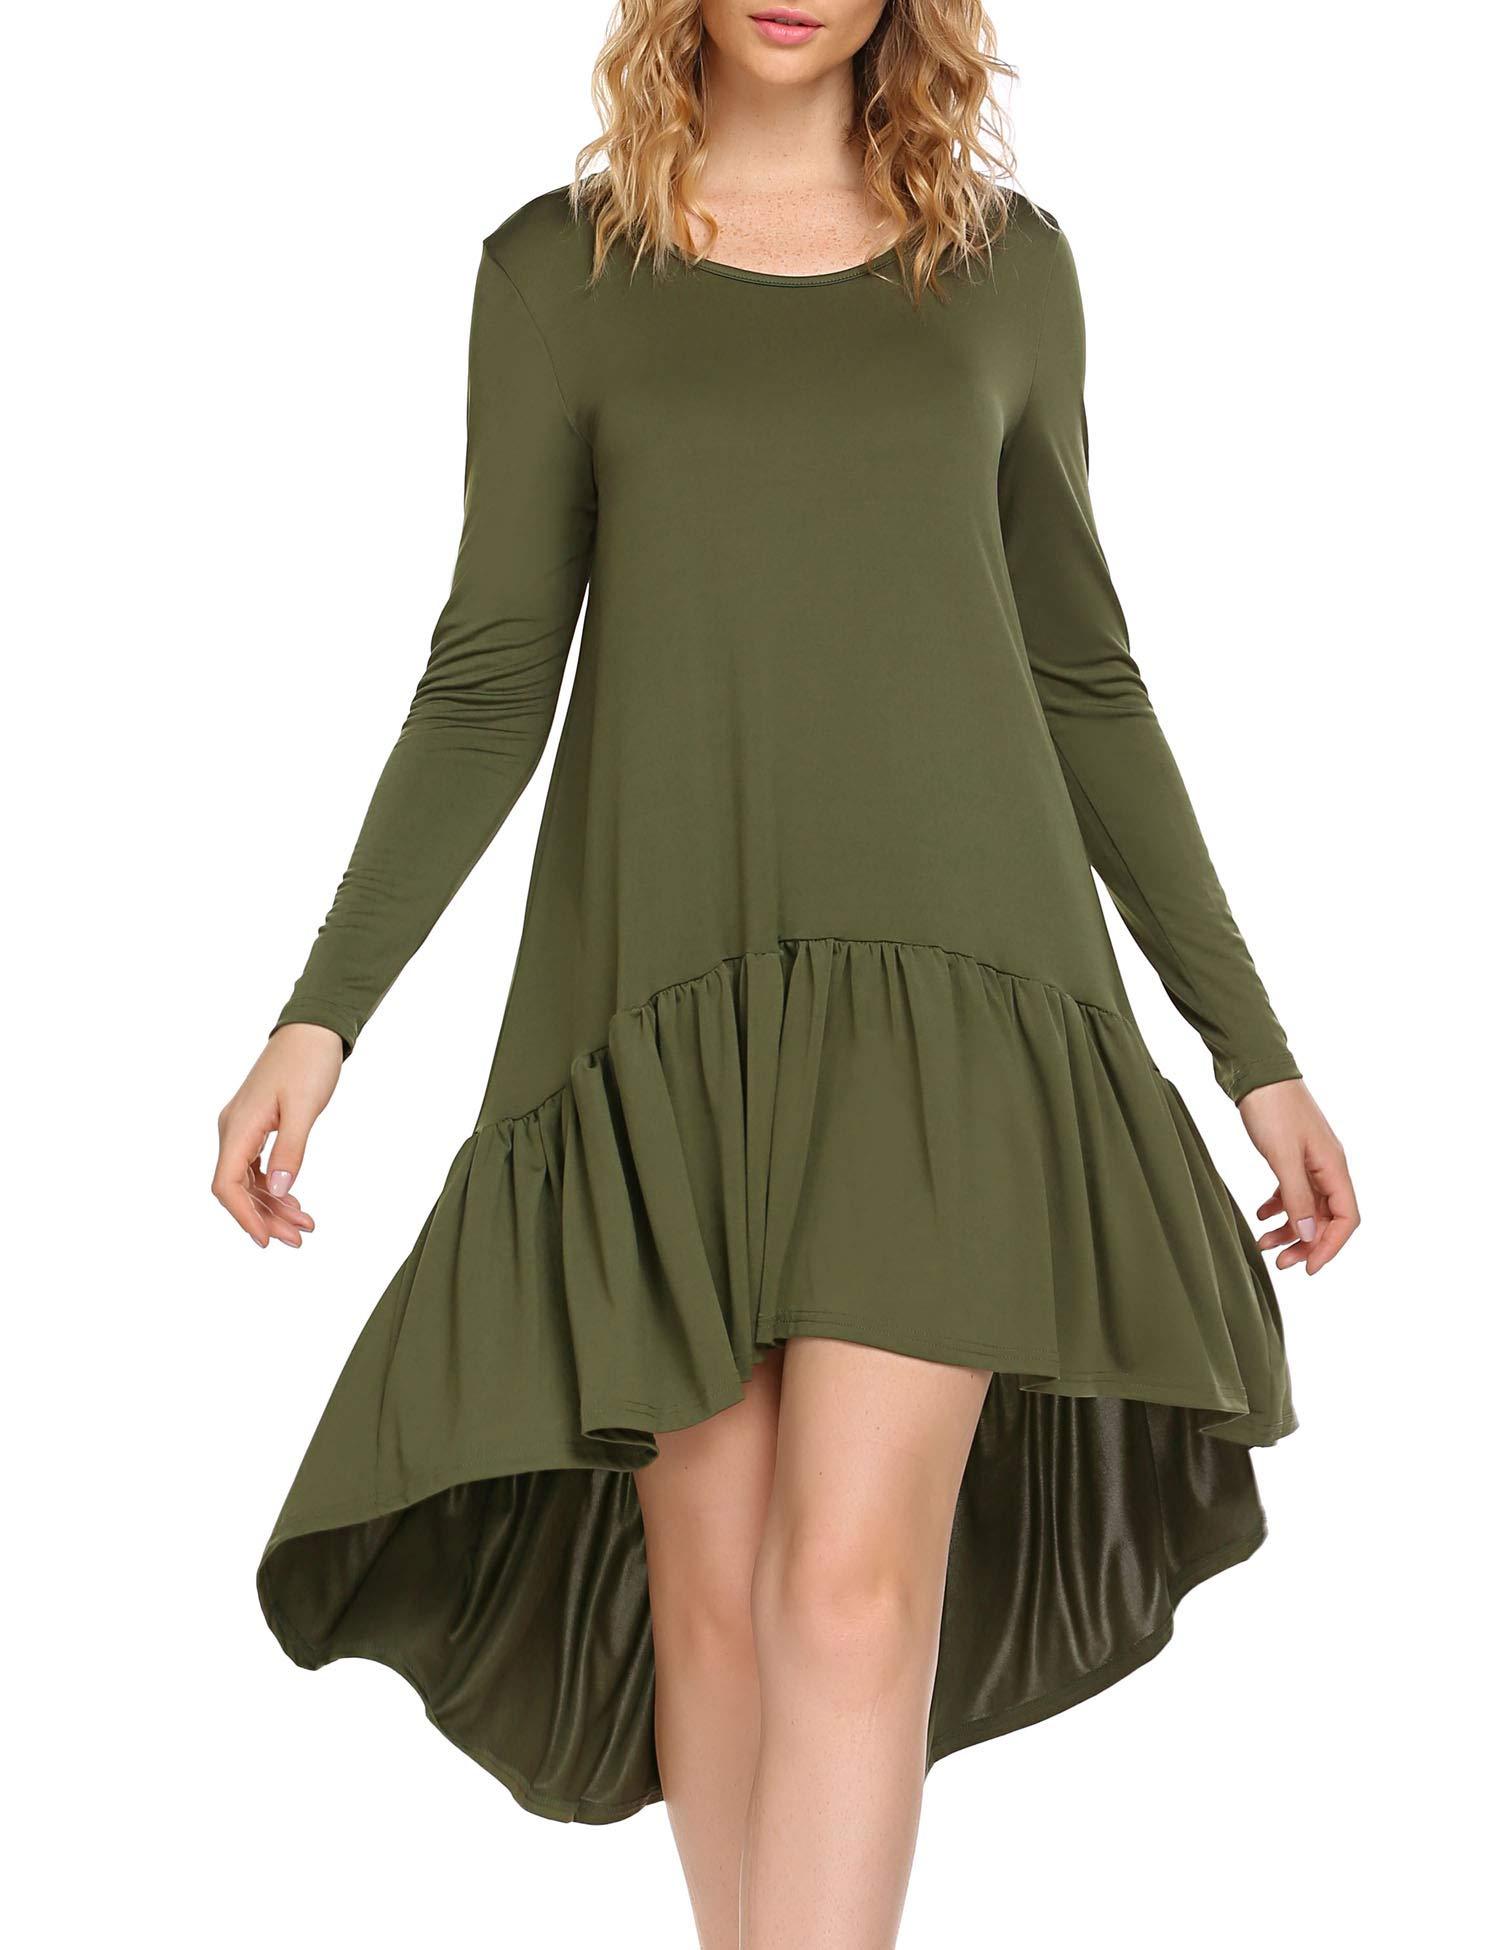 Zeagoo Women Ruffle High Low Asymmetrical Hem Party Evening Midi Dress Army Green